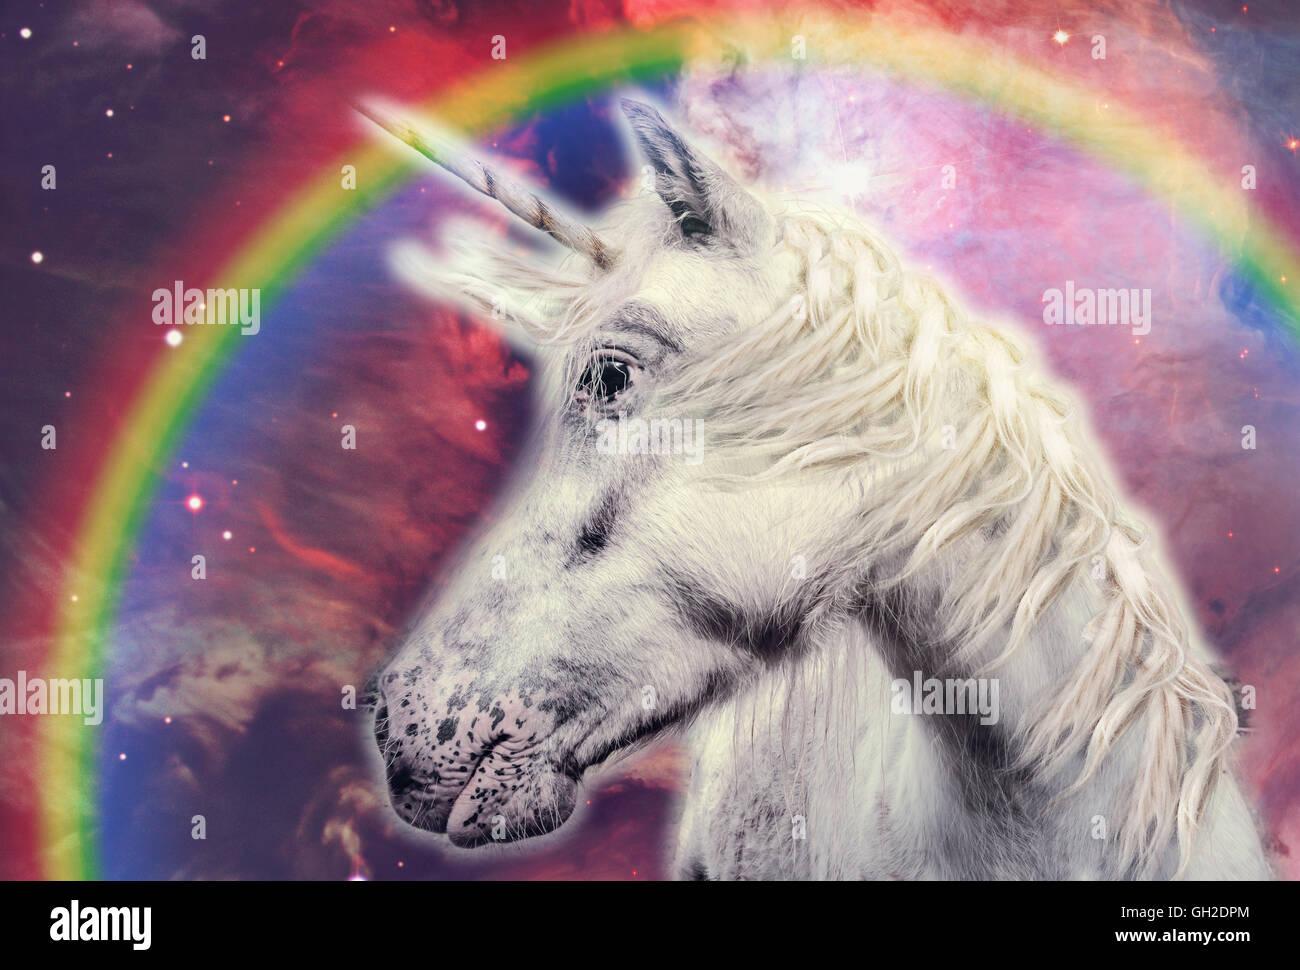 Unicorn With Rainbow In The Galaxy Stock Photo Alamy